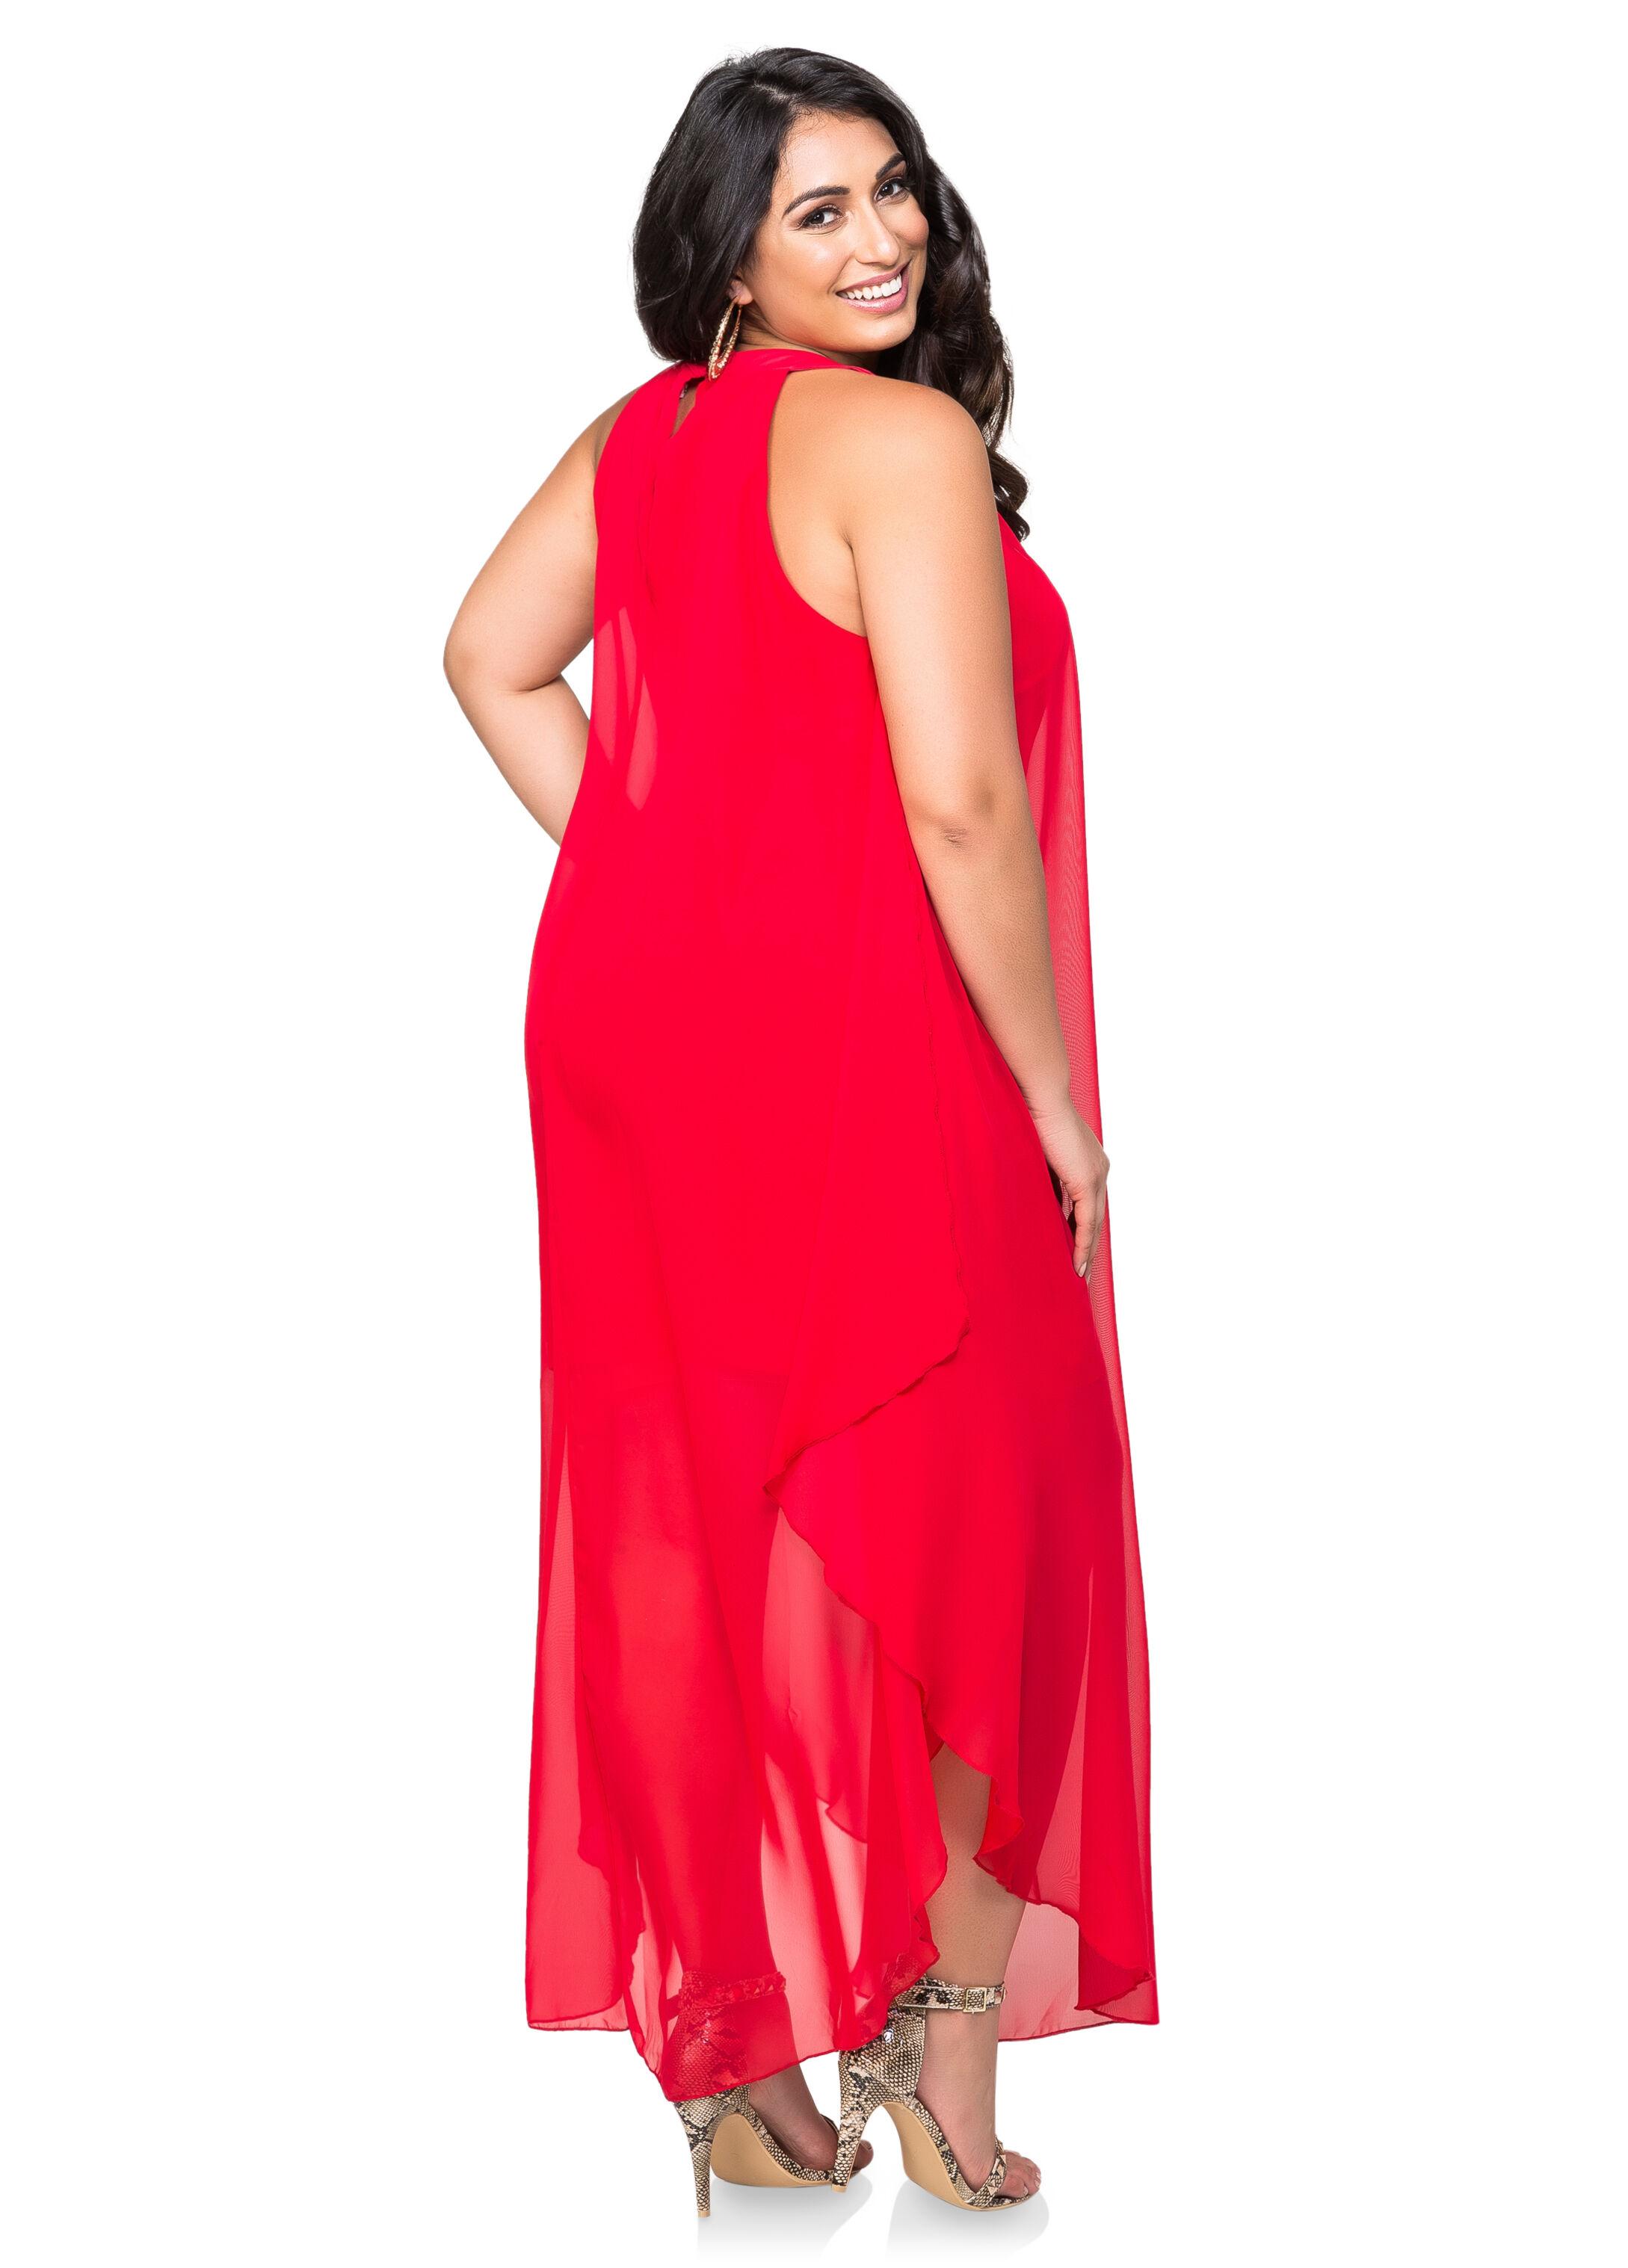 Red dress 3x equals